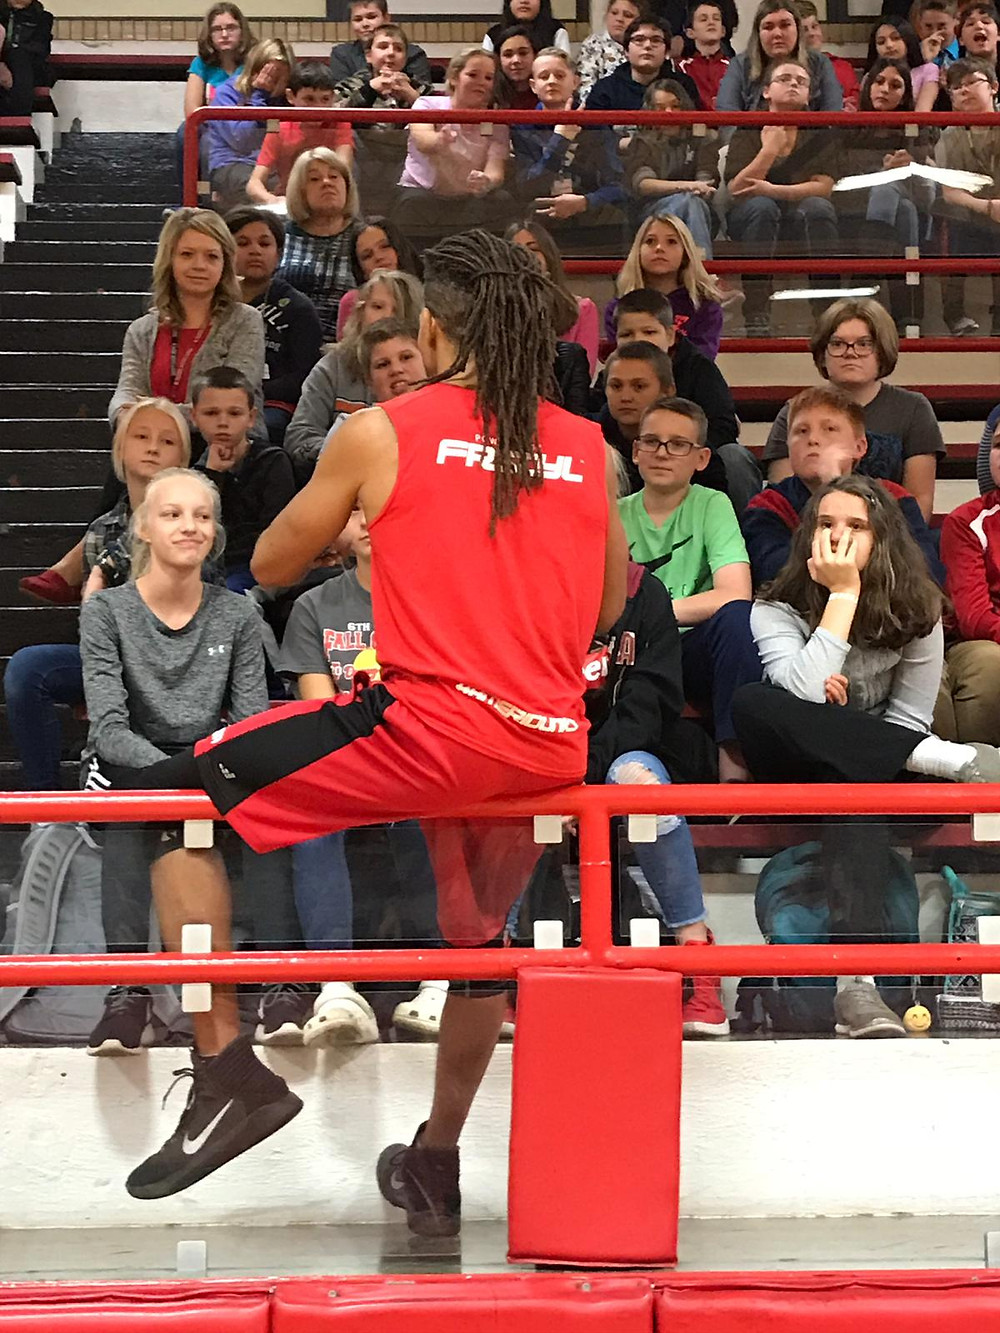 JLB in red speaking to Jr. High students in bleachers